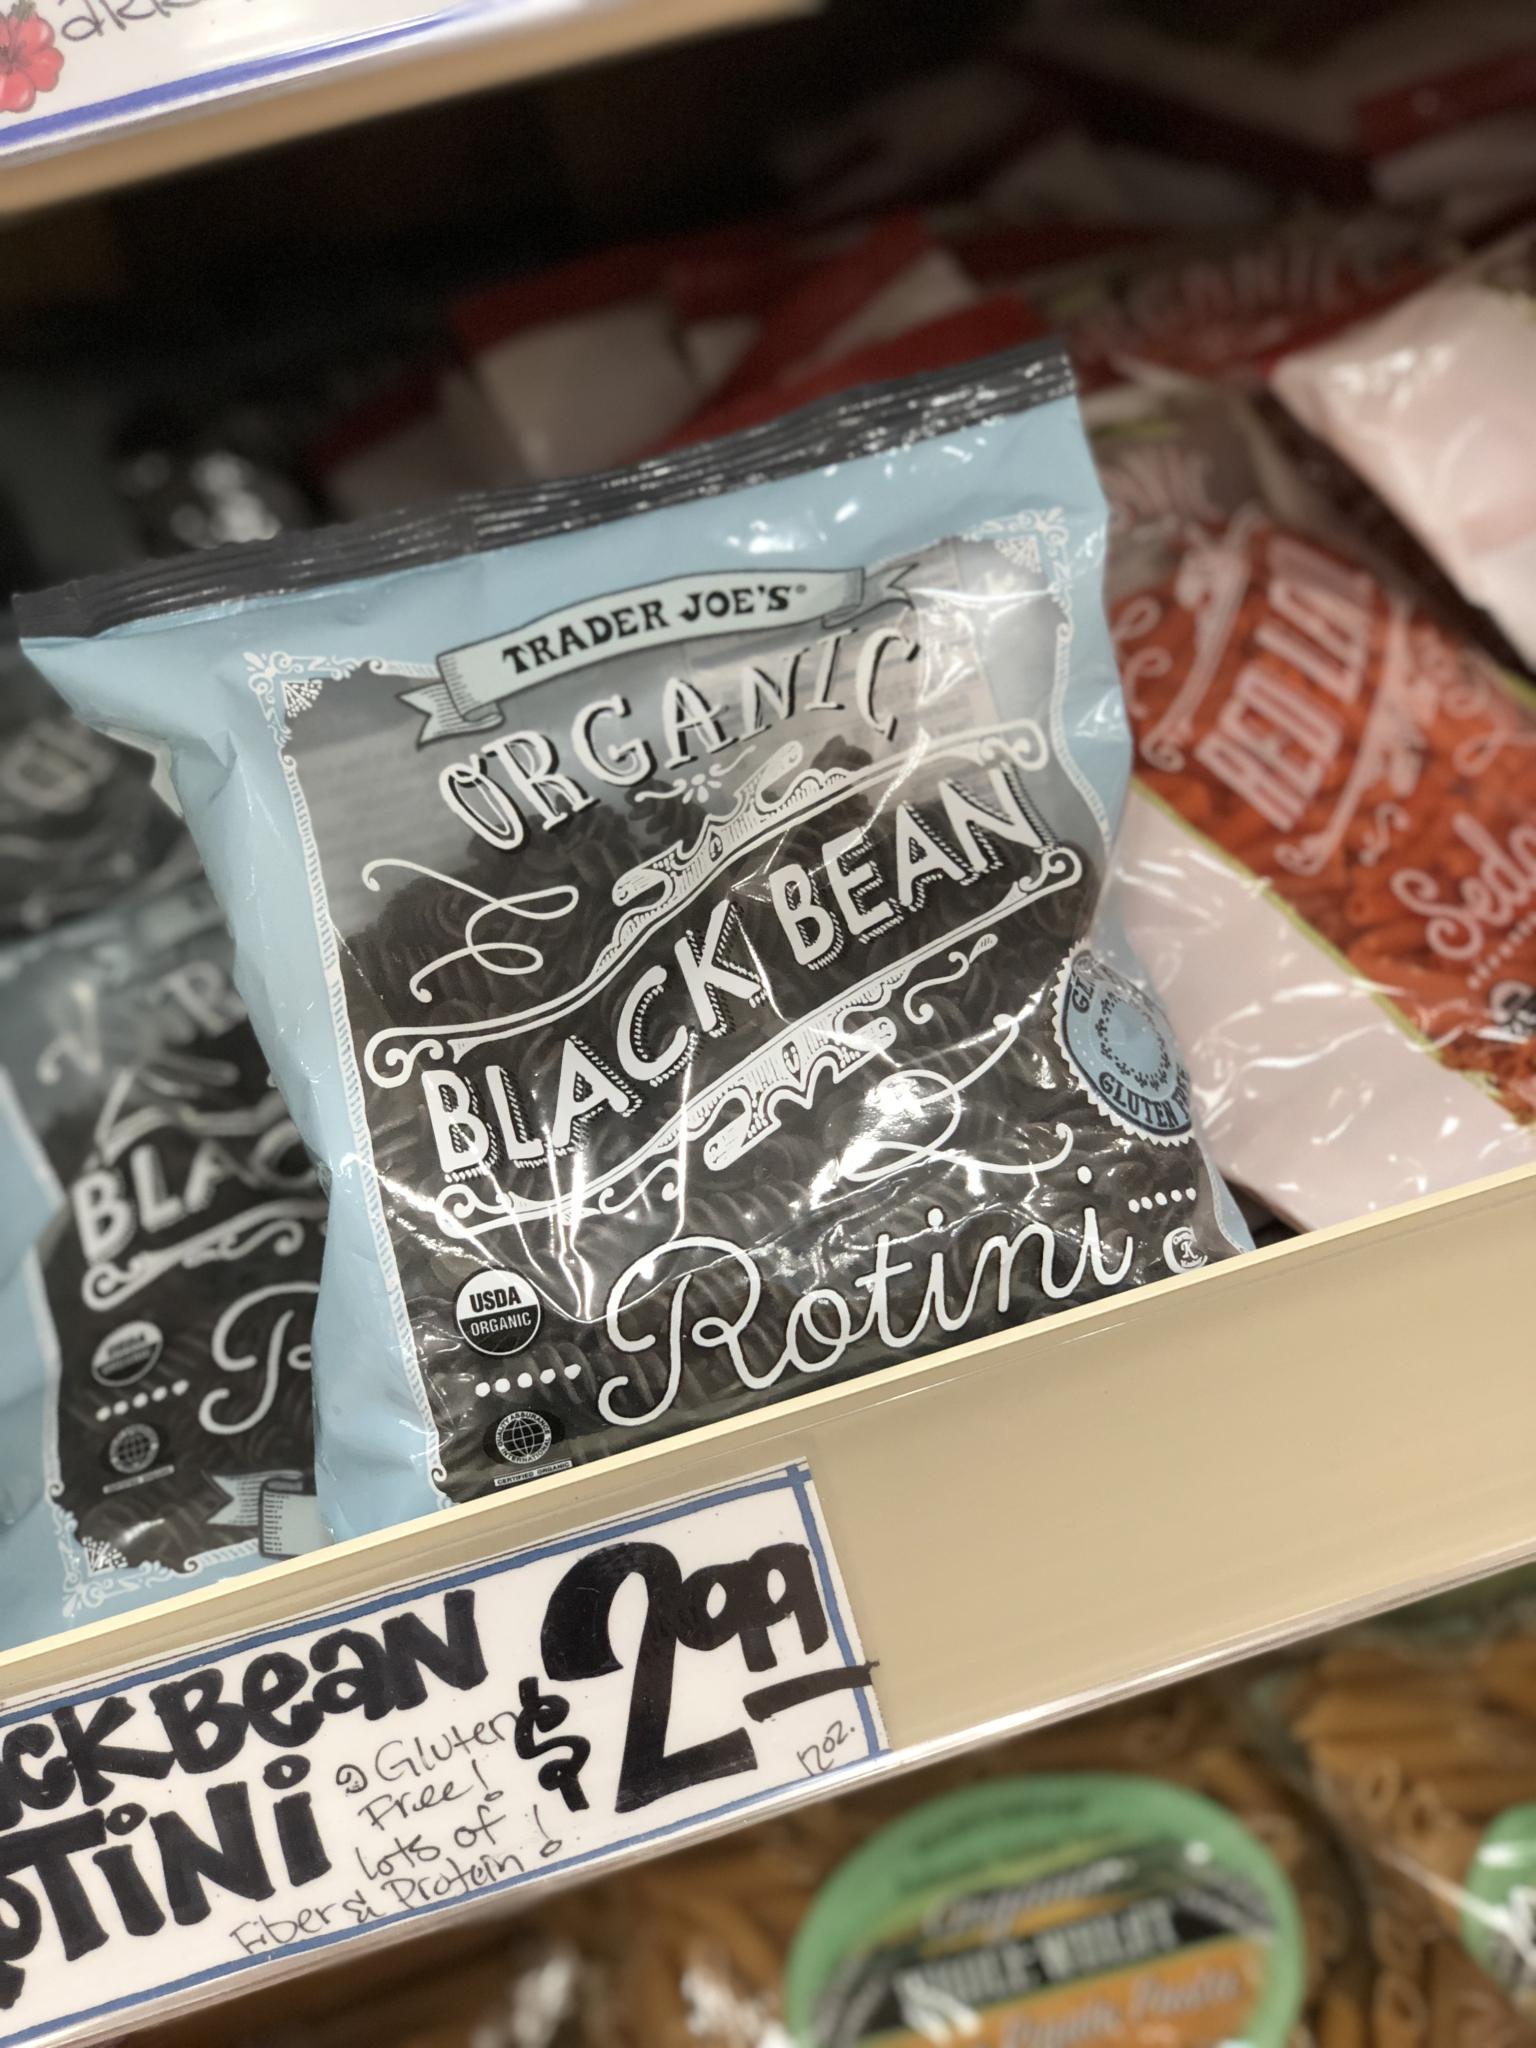 Gluten-free Organic Black Bean Rotini pasta from Trader Joe's